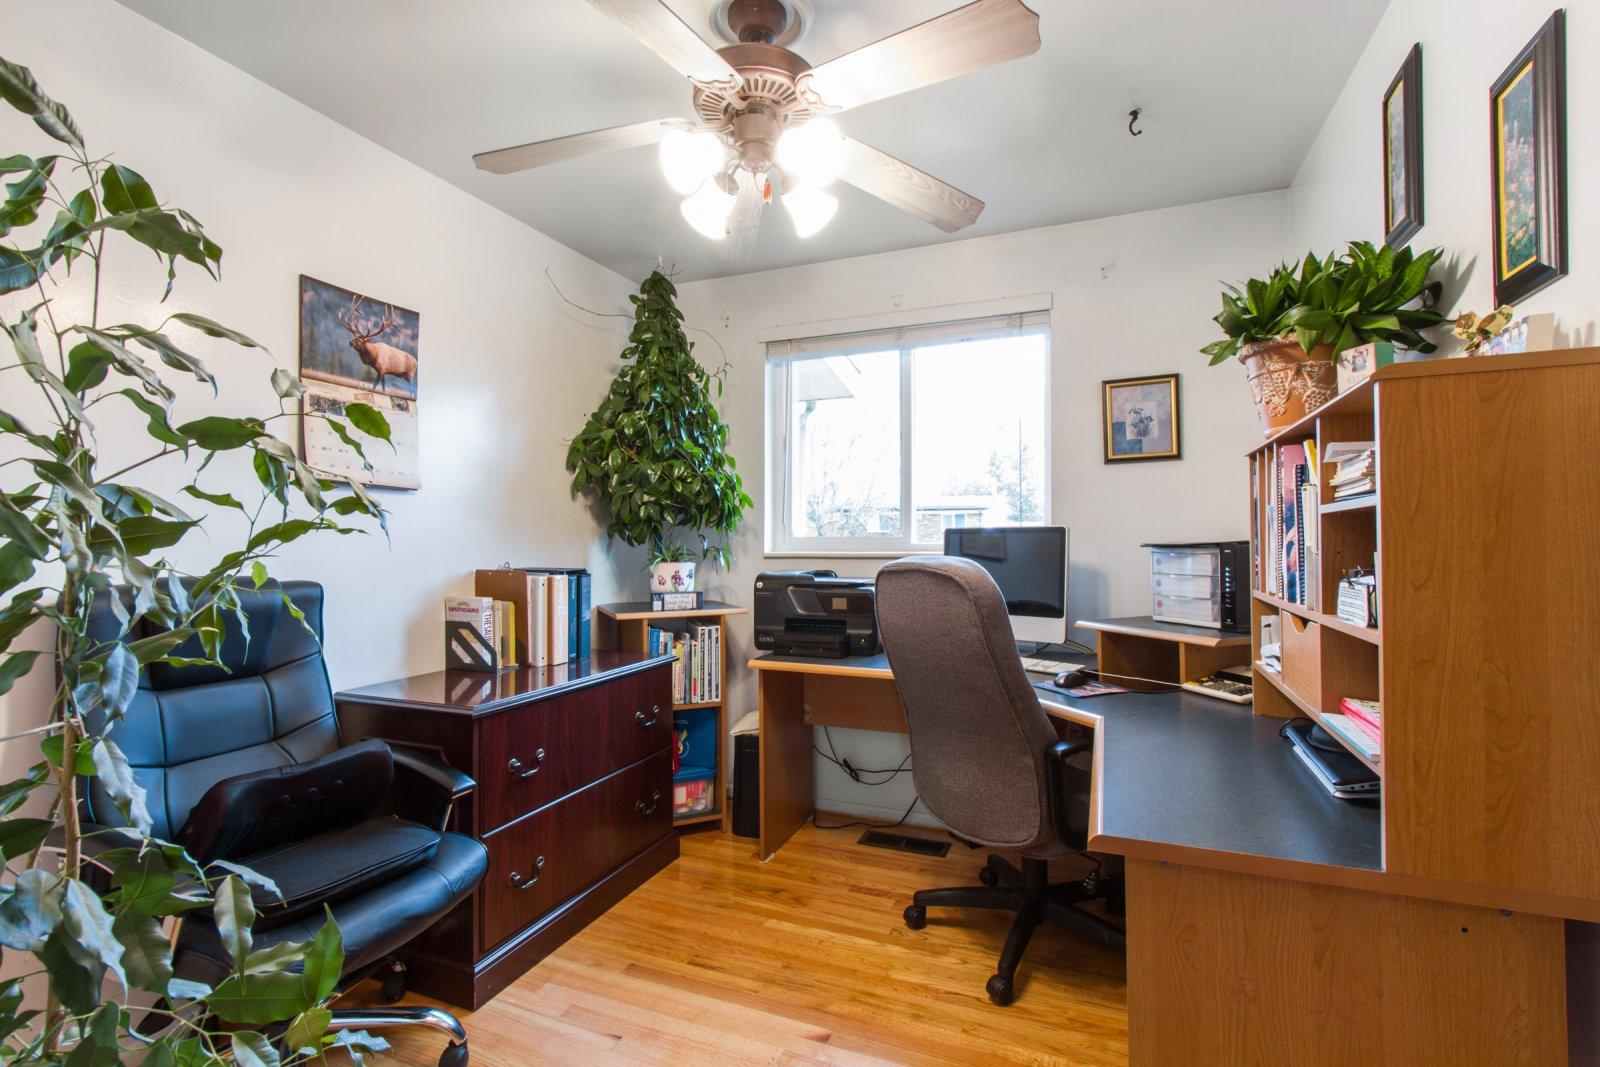 home for sale Layton Utah by Utahhomes.biz property picture 11